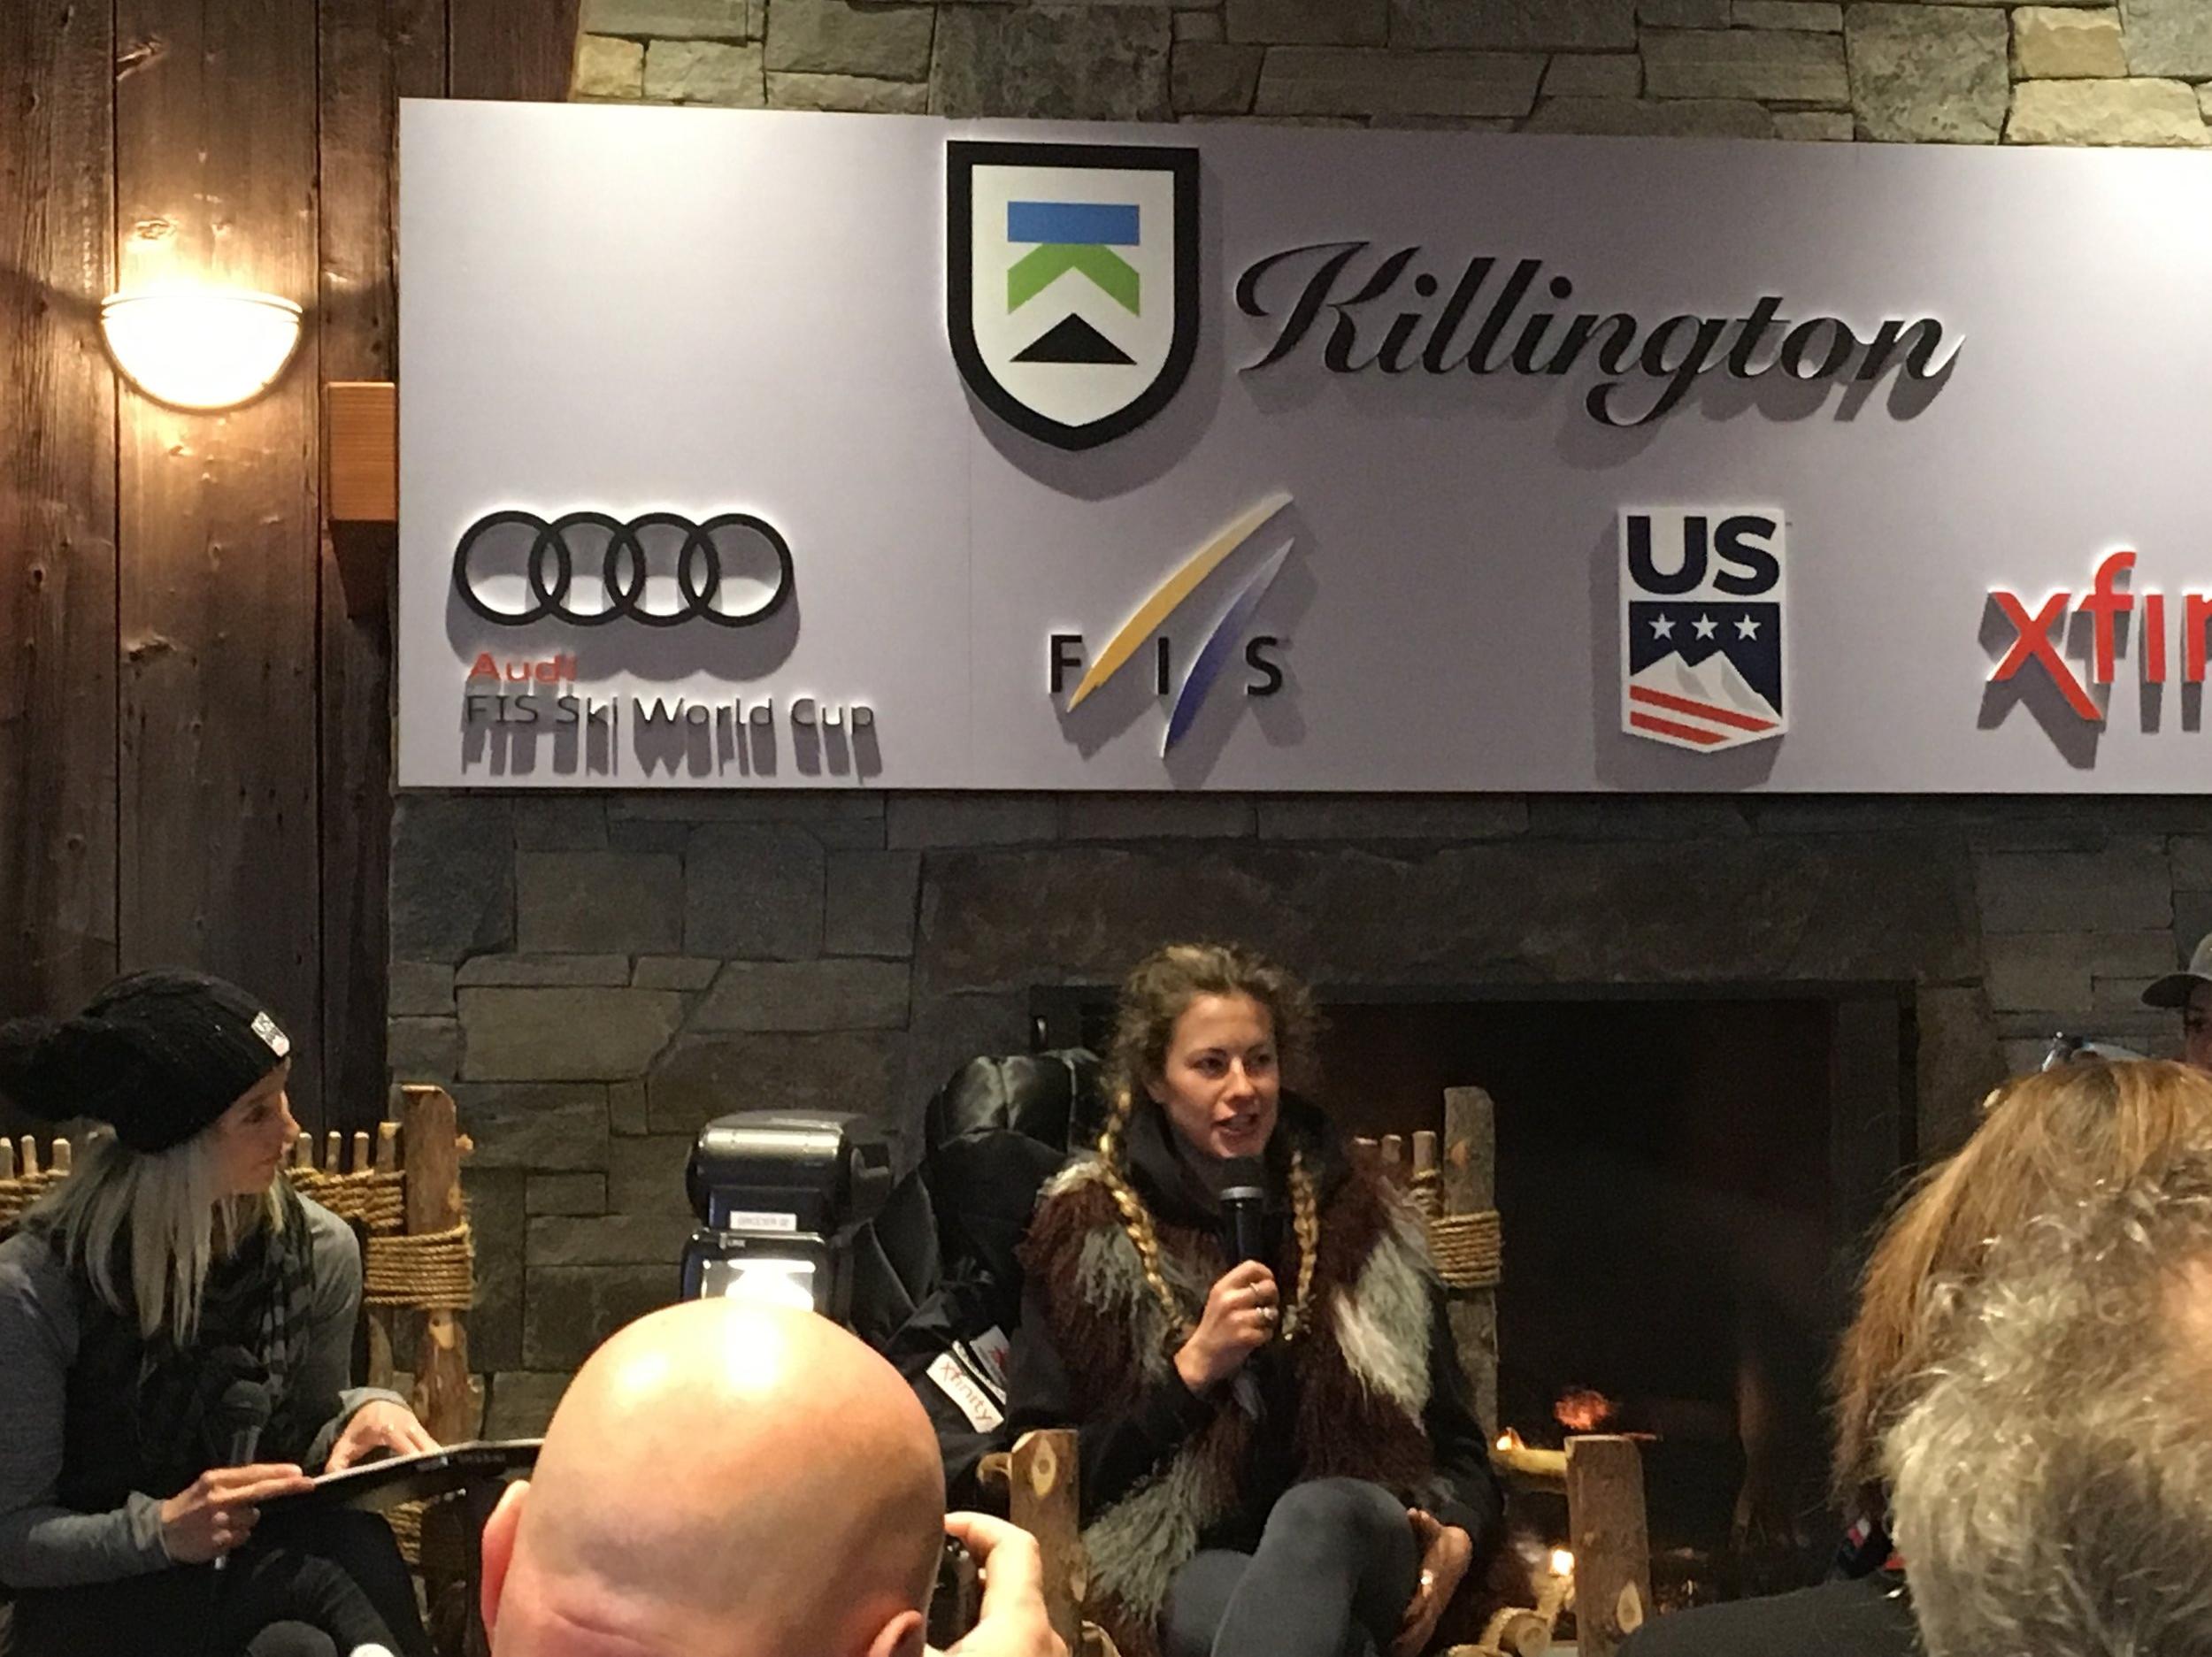 U.S.A.'s Resi Stiegler at a press conference ahead of the Killington FIS World Cup, 2017.